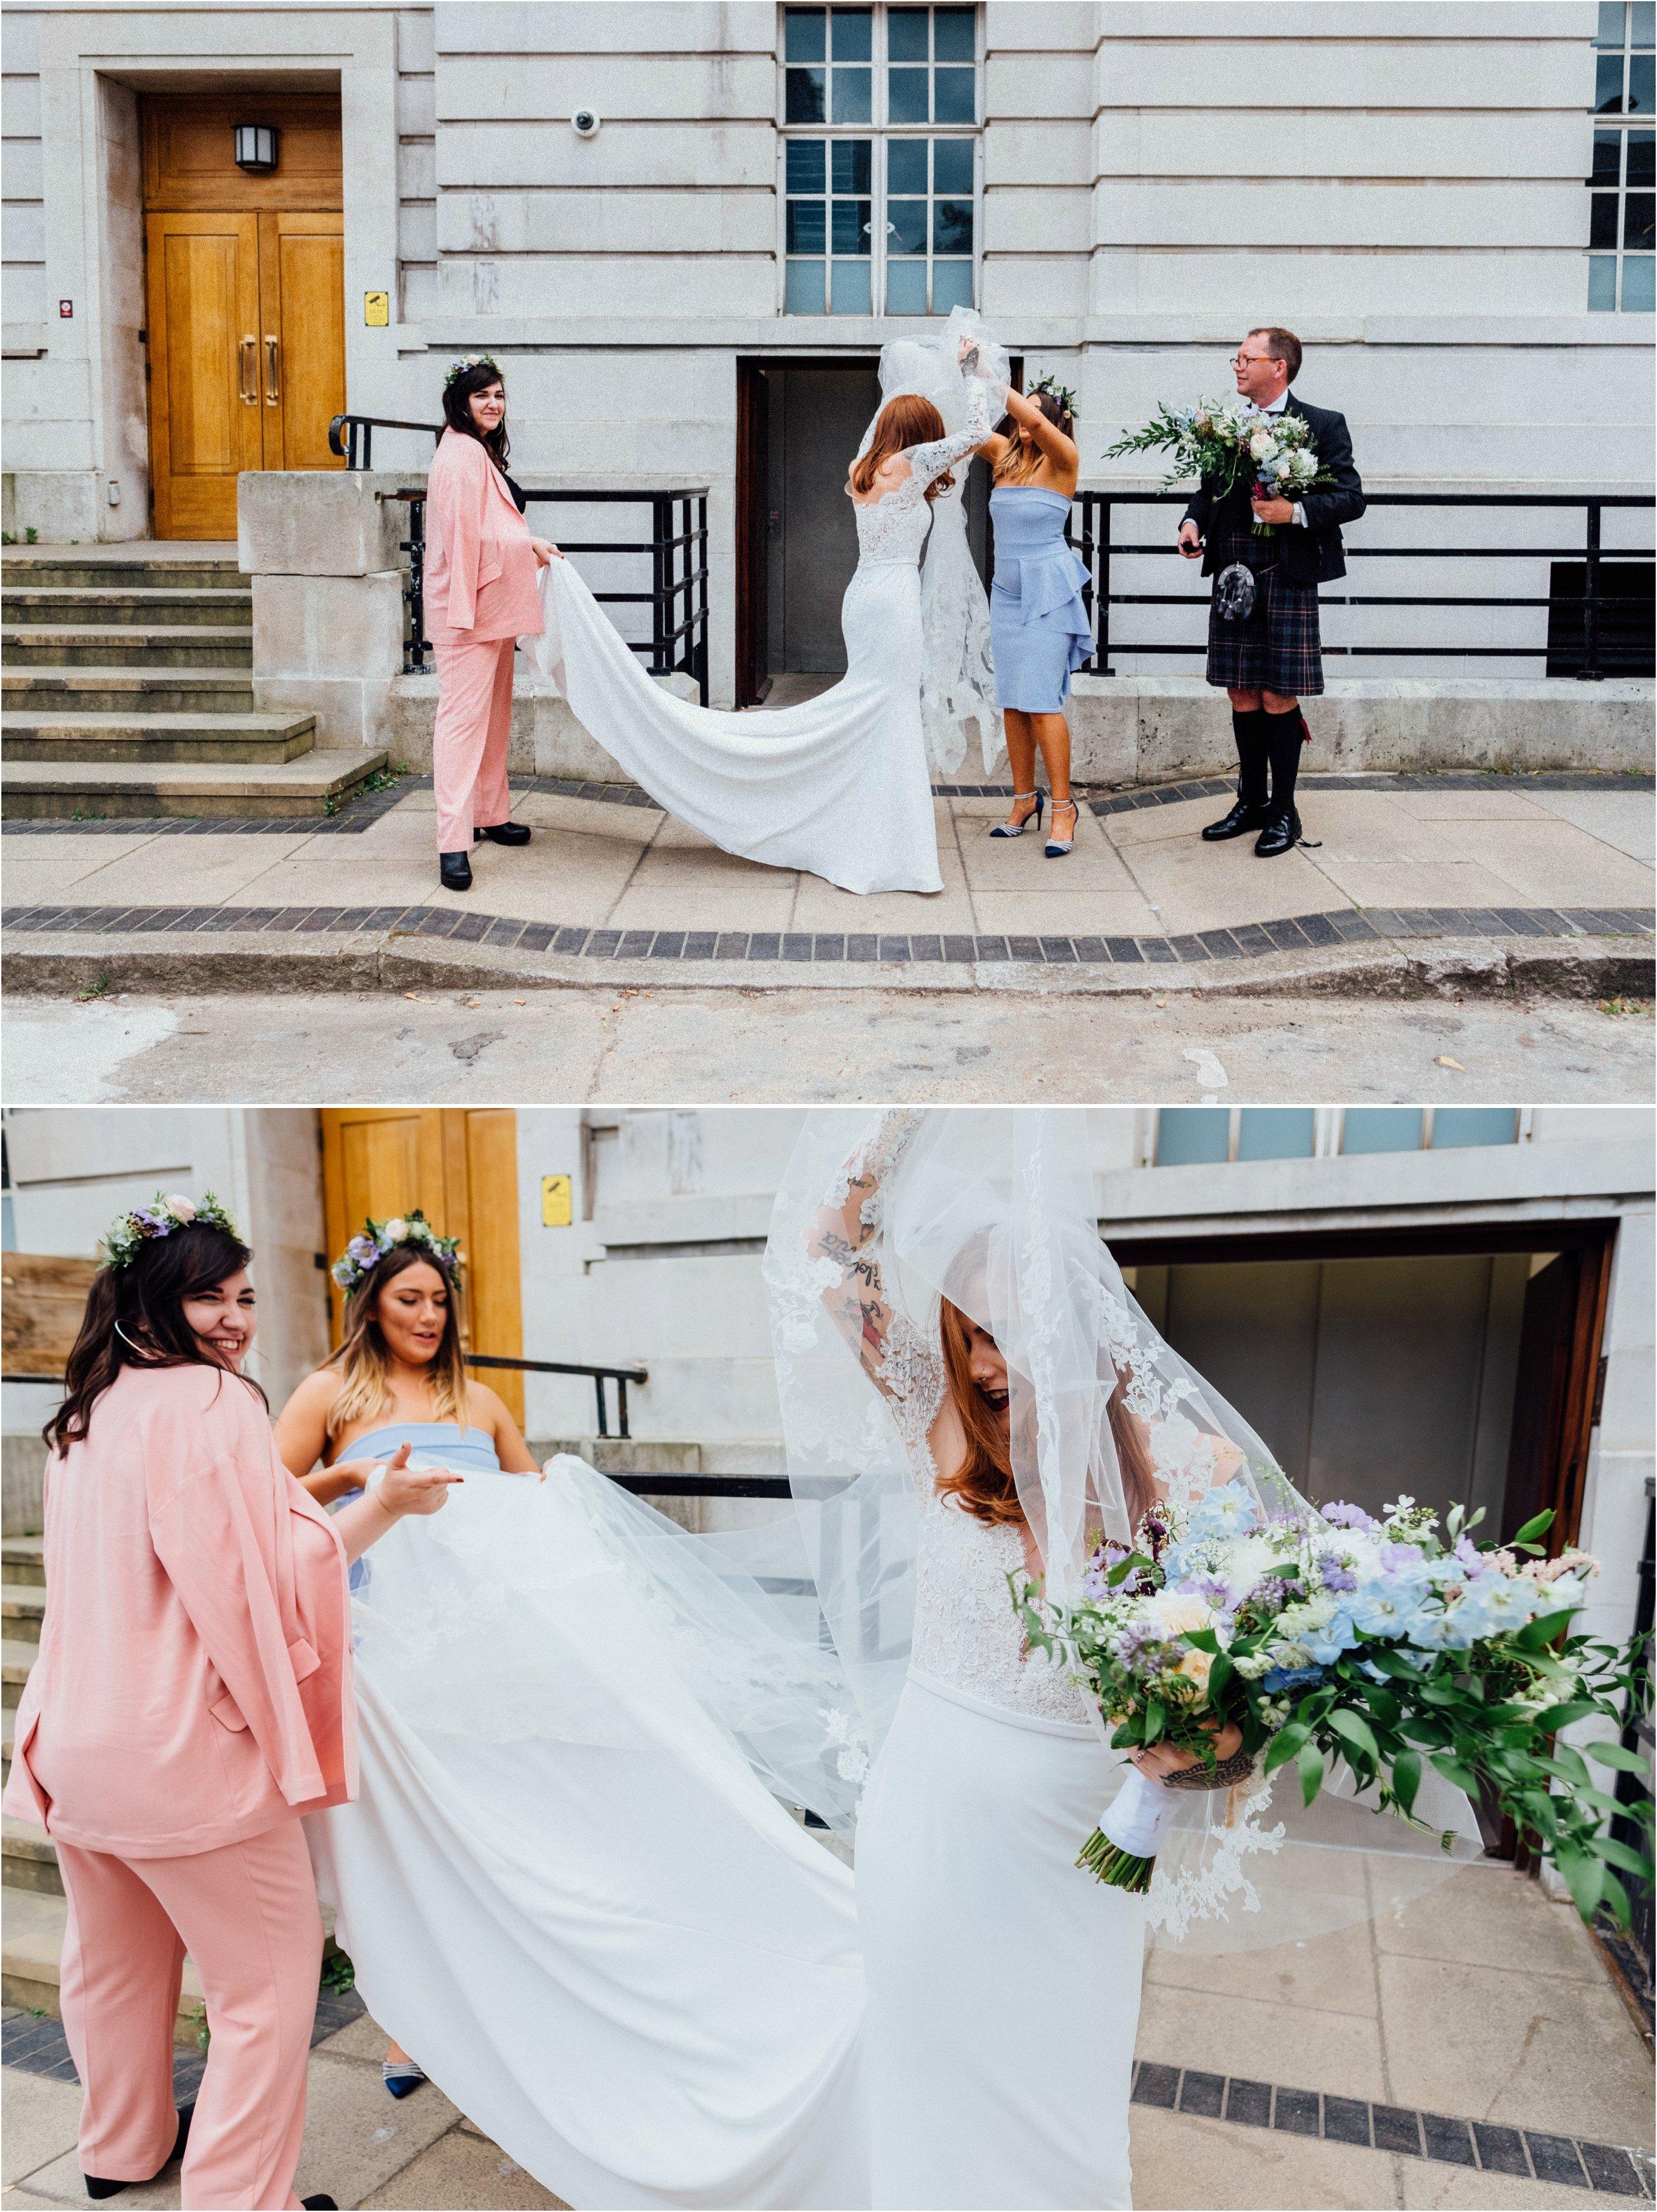 Hackney town hall wedding photography_0046.jpg